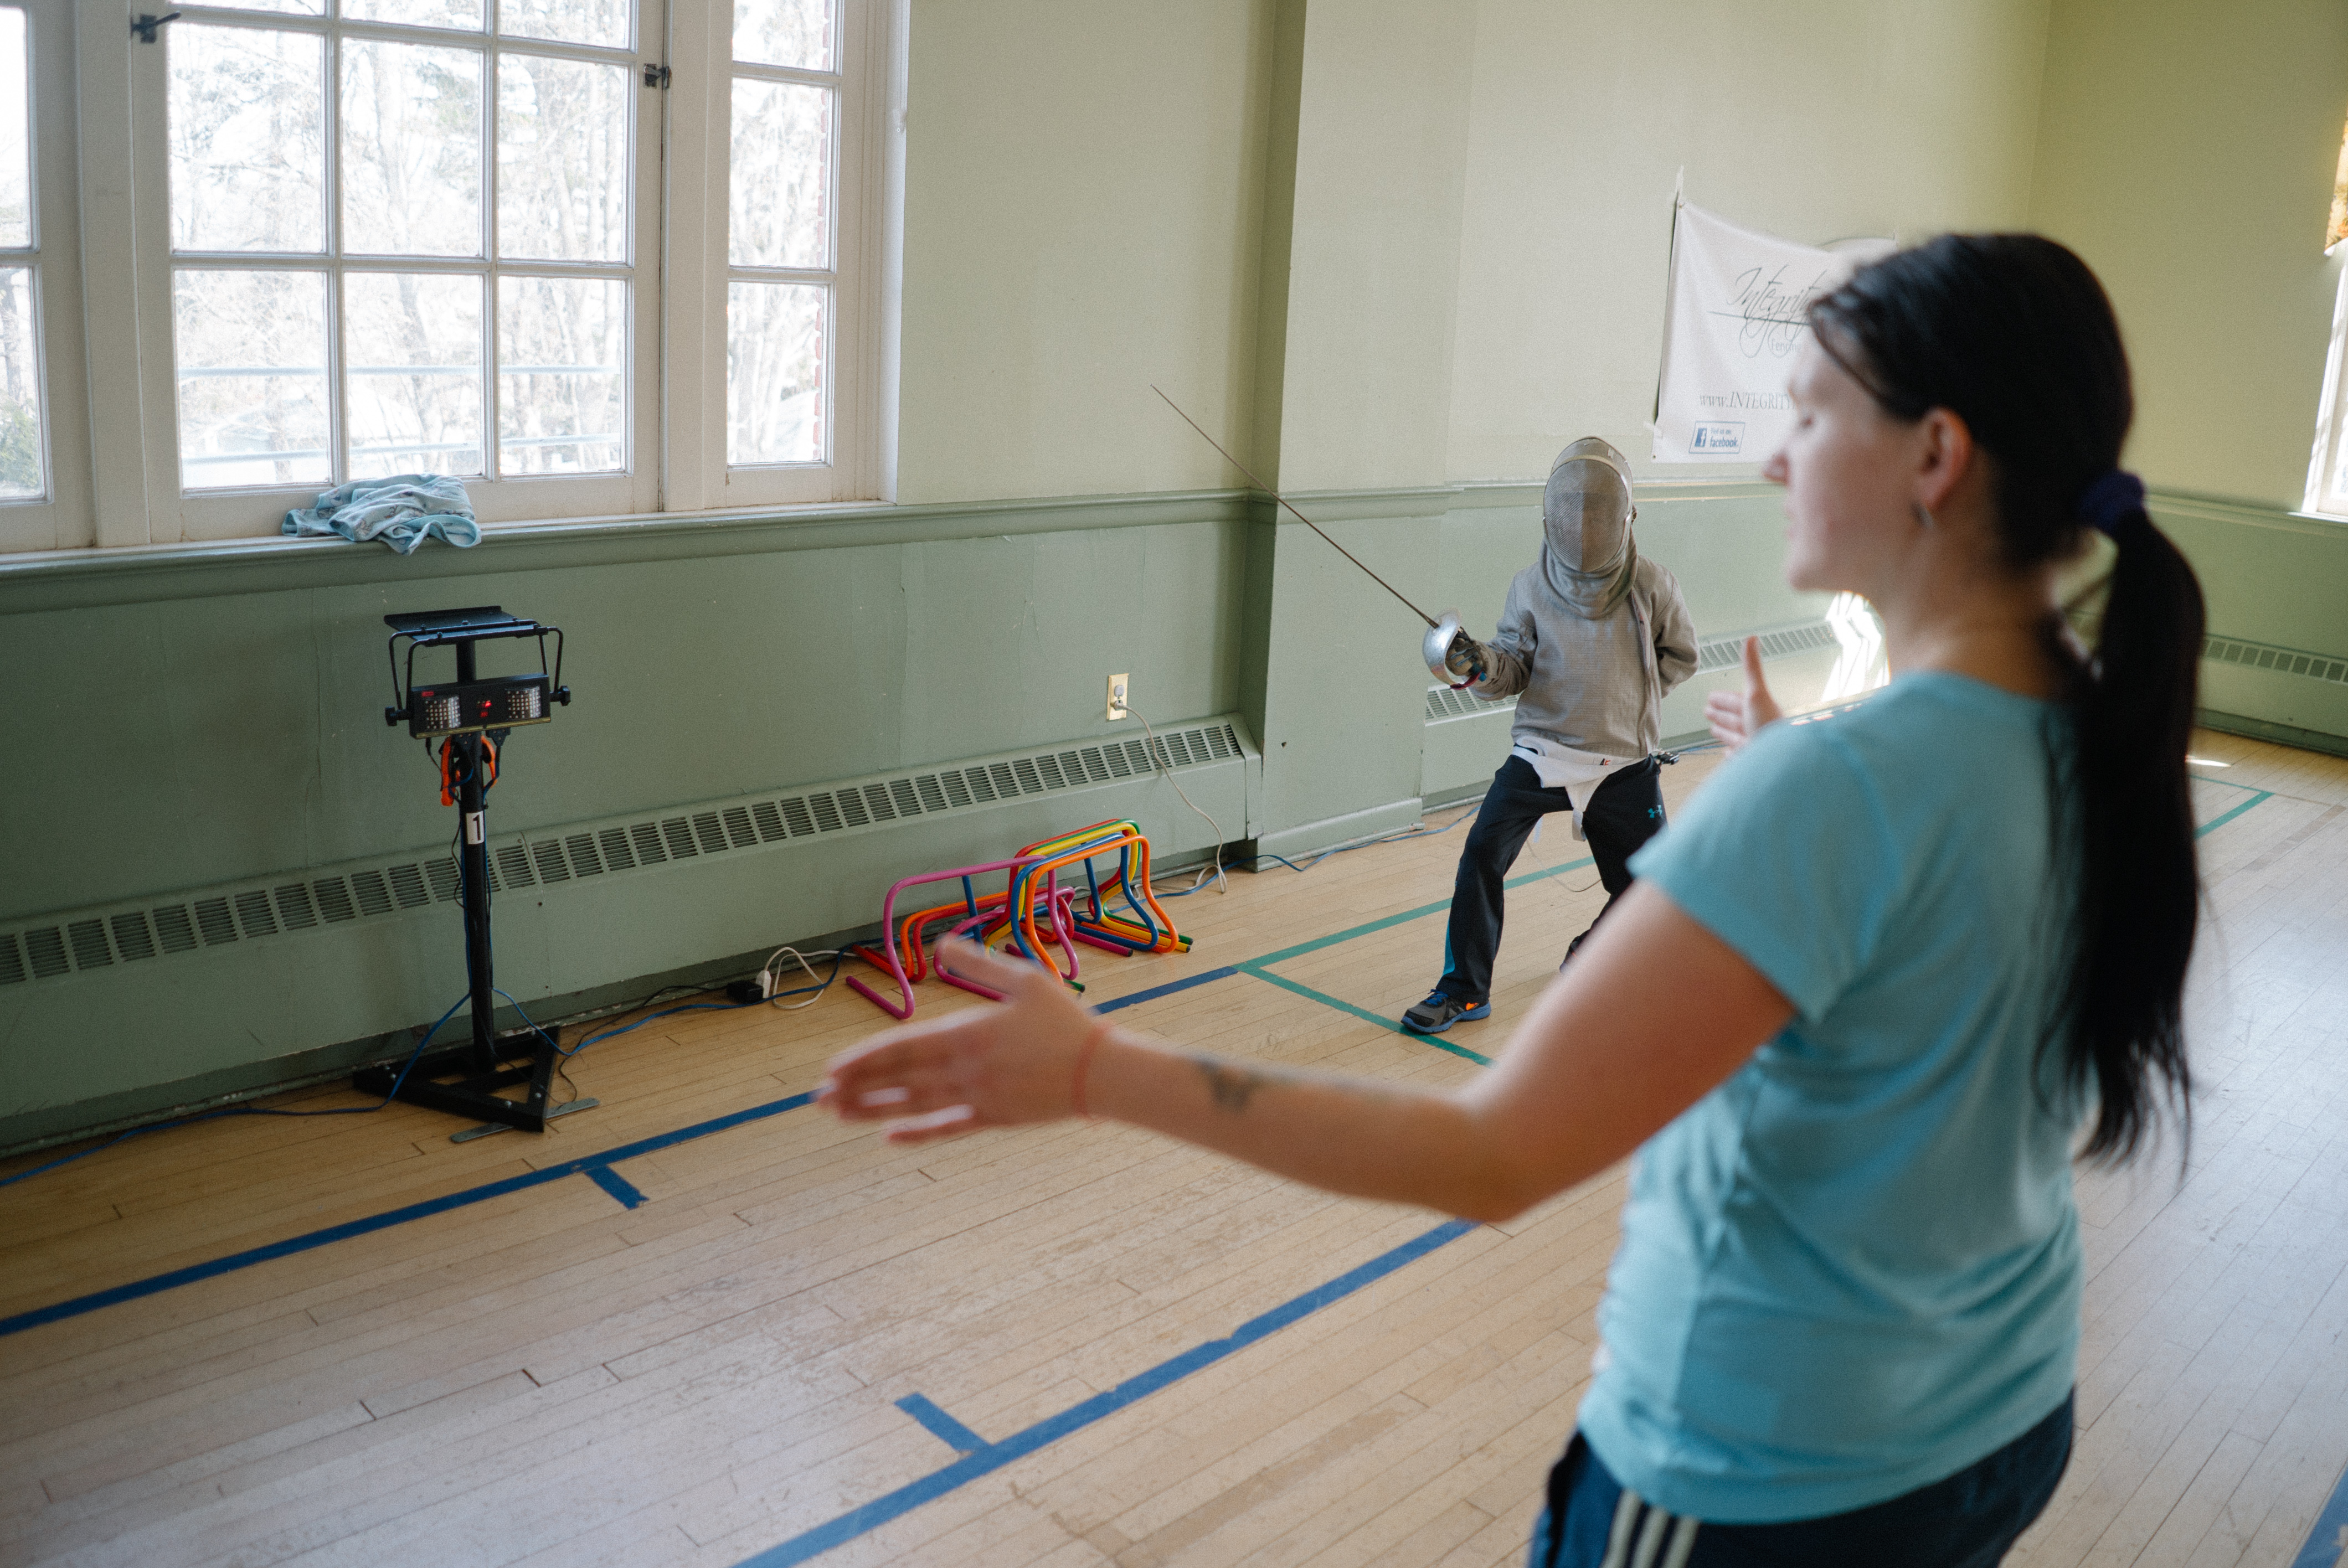 fencing-15.jpg